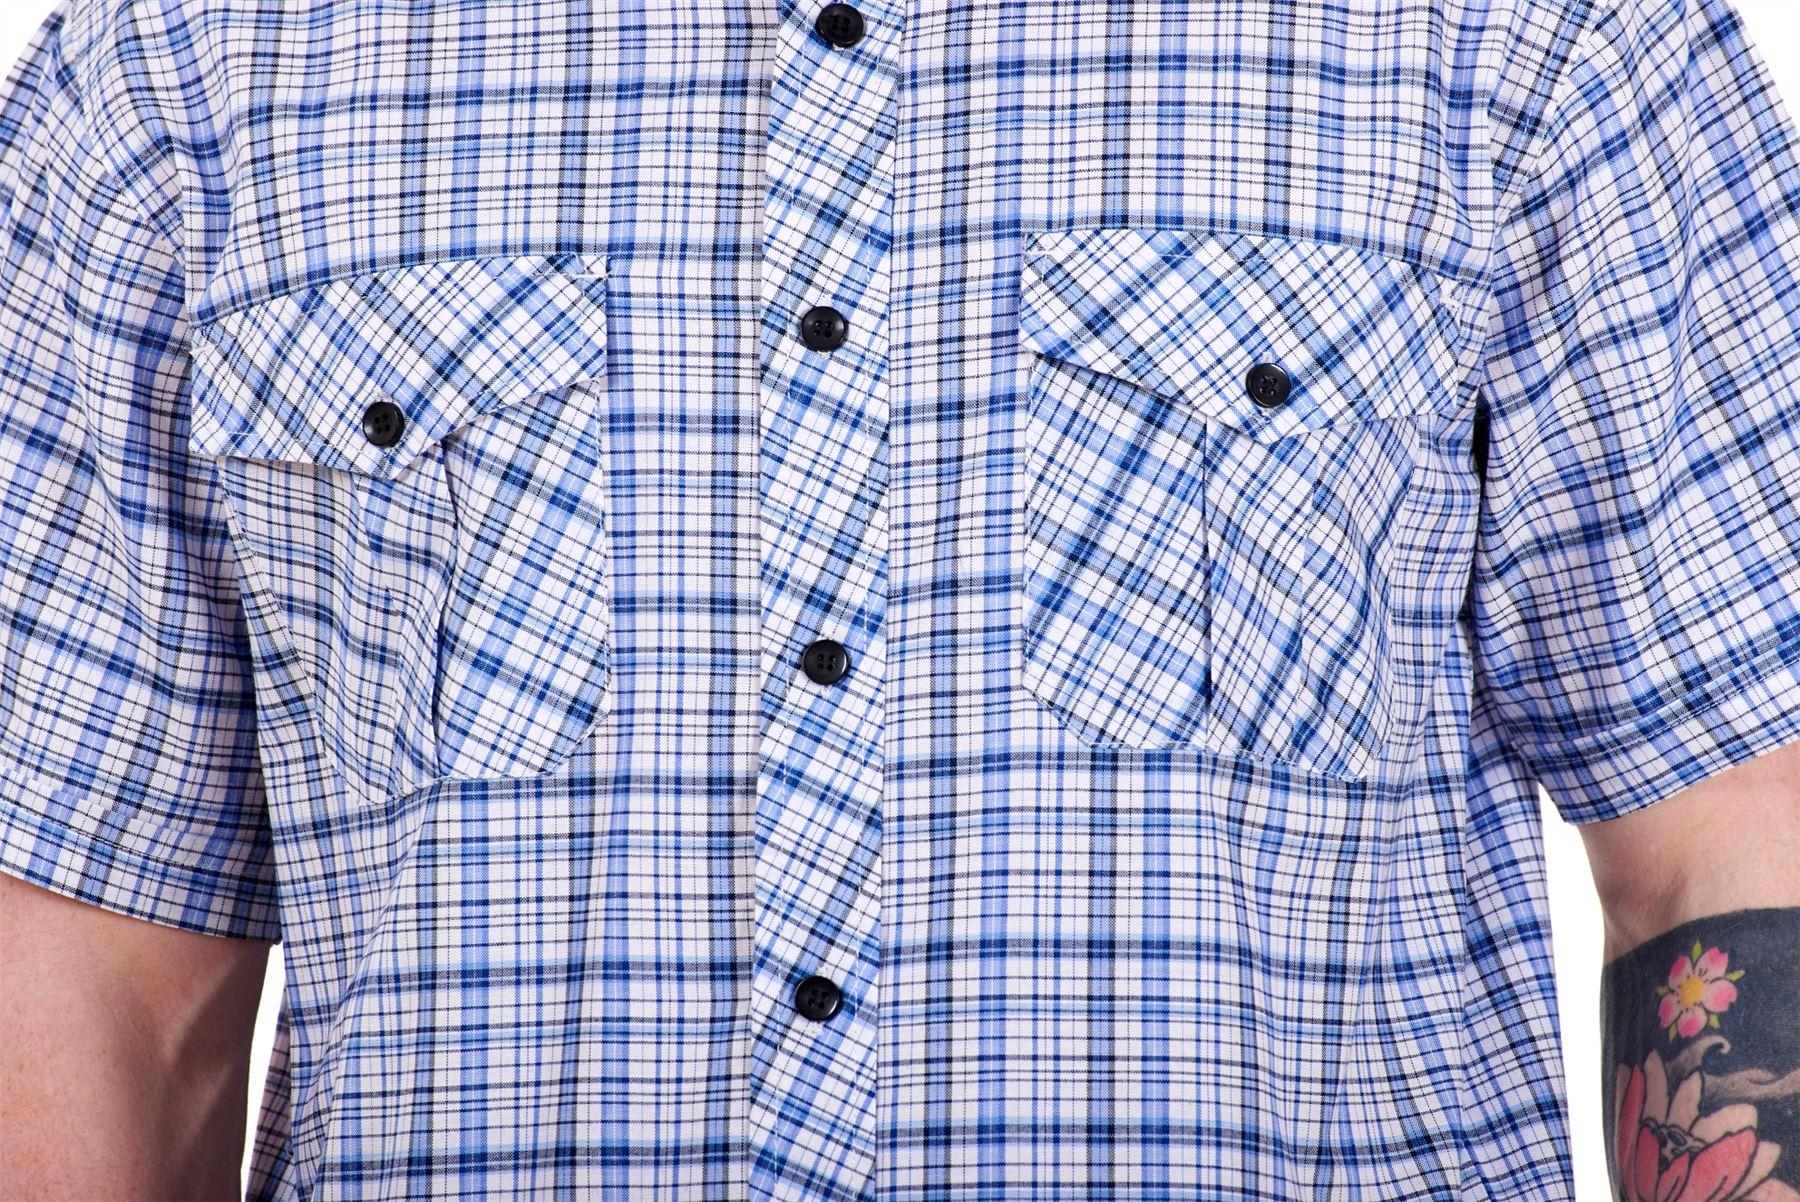 Mens-Regular-Big-Size-Shirts-Checked-Cotton-Blend-Casual-Short-Sleeve-M-to-5XL thumbnail 4